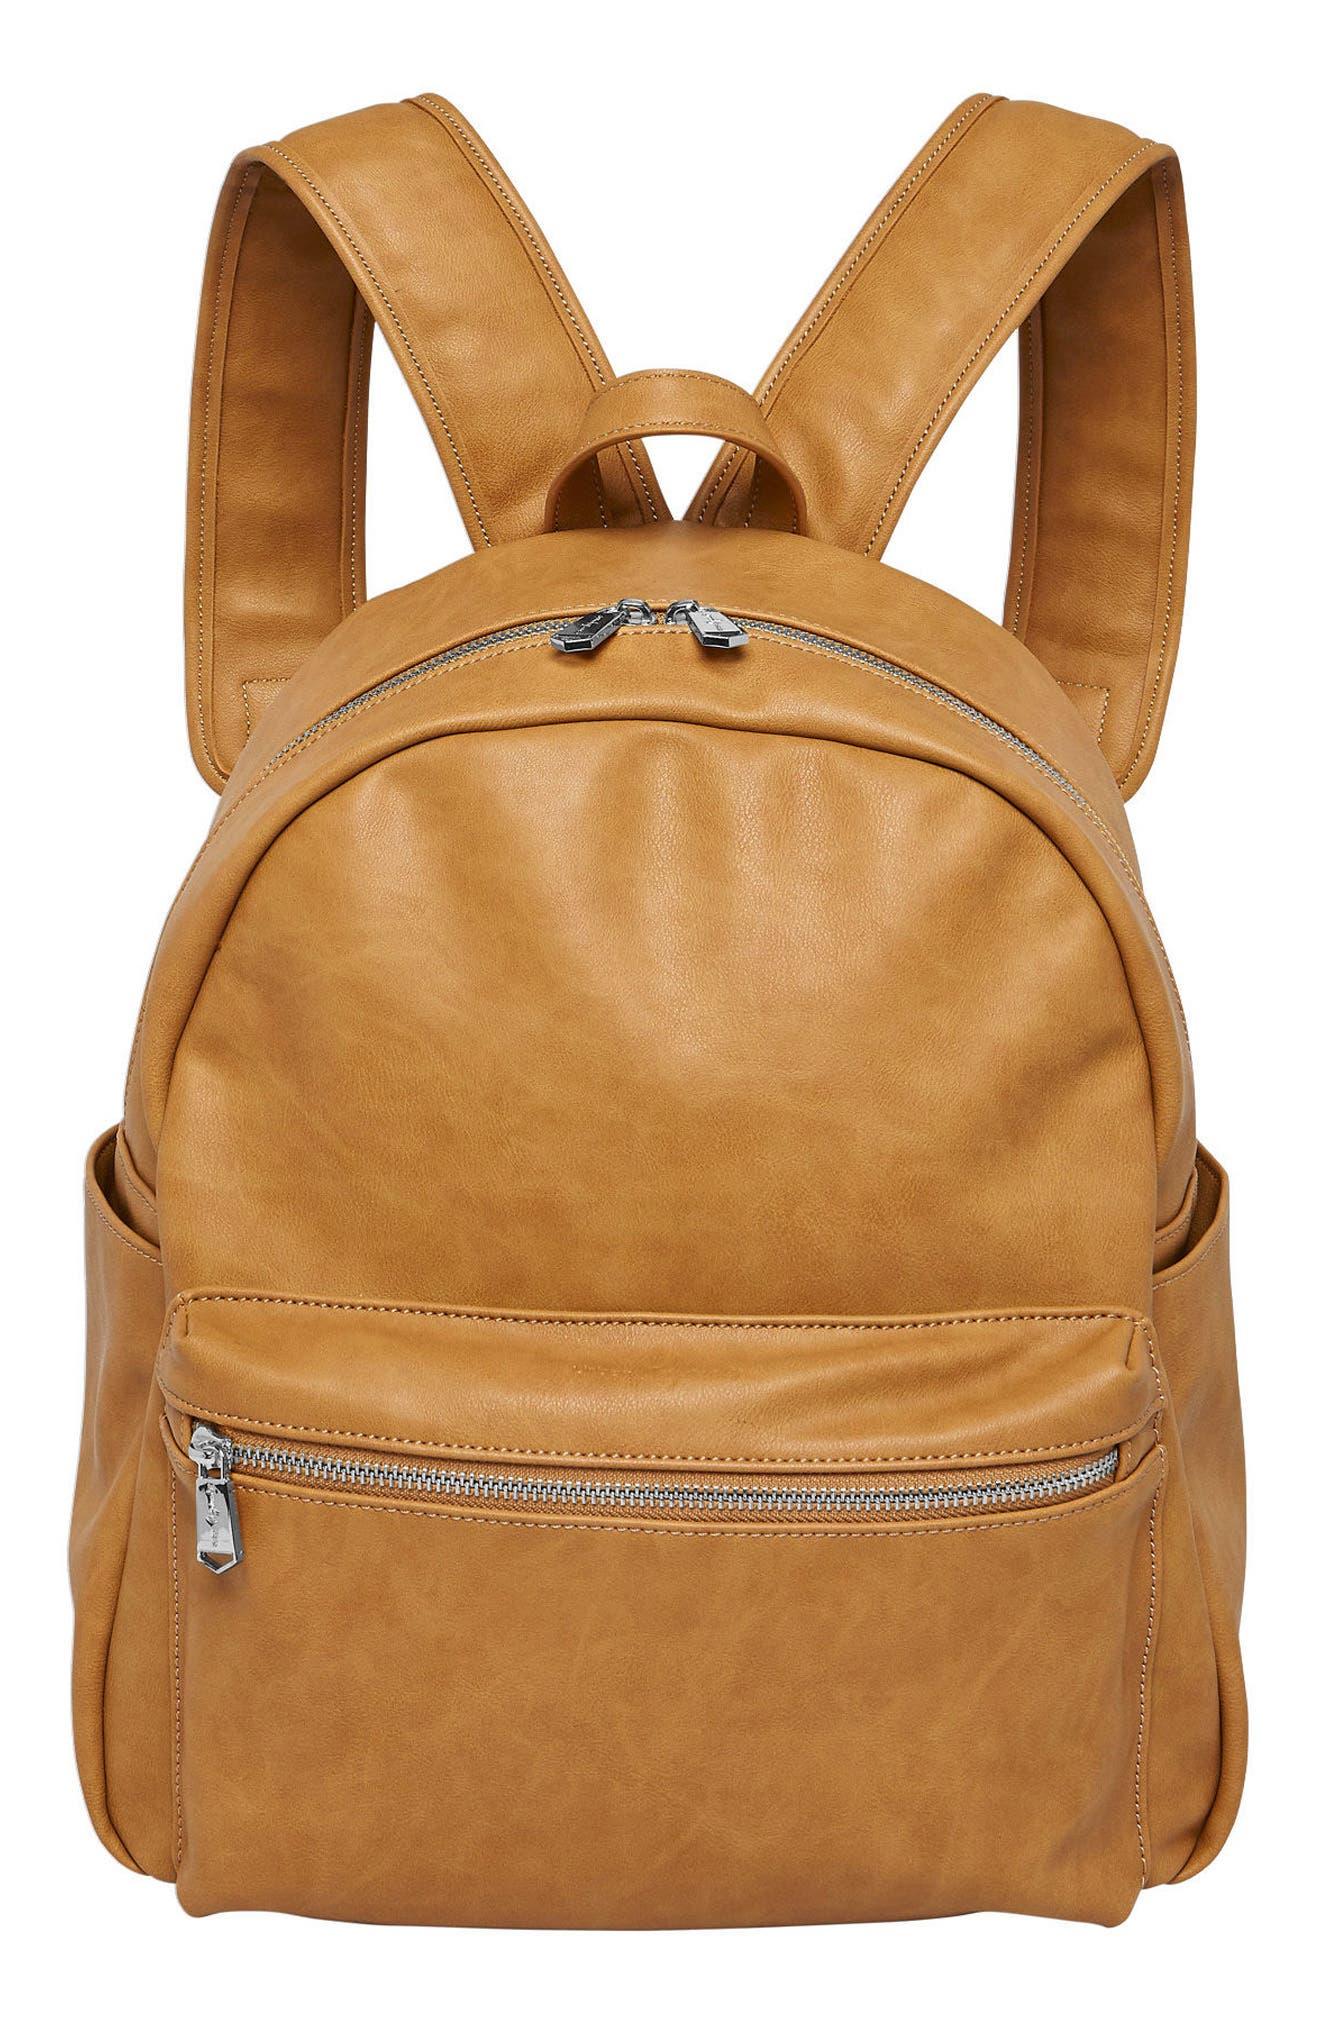 Practical Vegan Leather Backpack,                             Main thumbnail 1, color,                             CAMEL